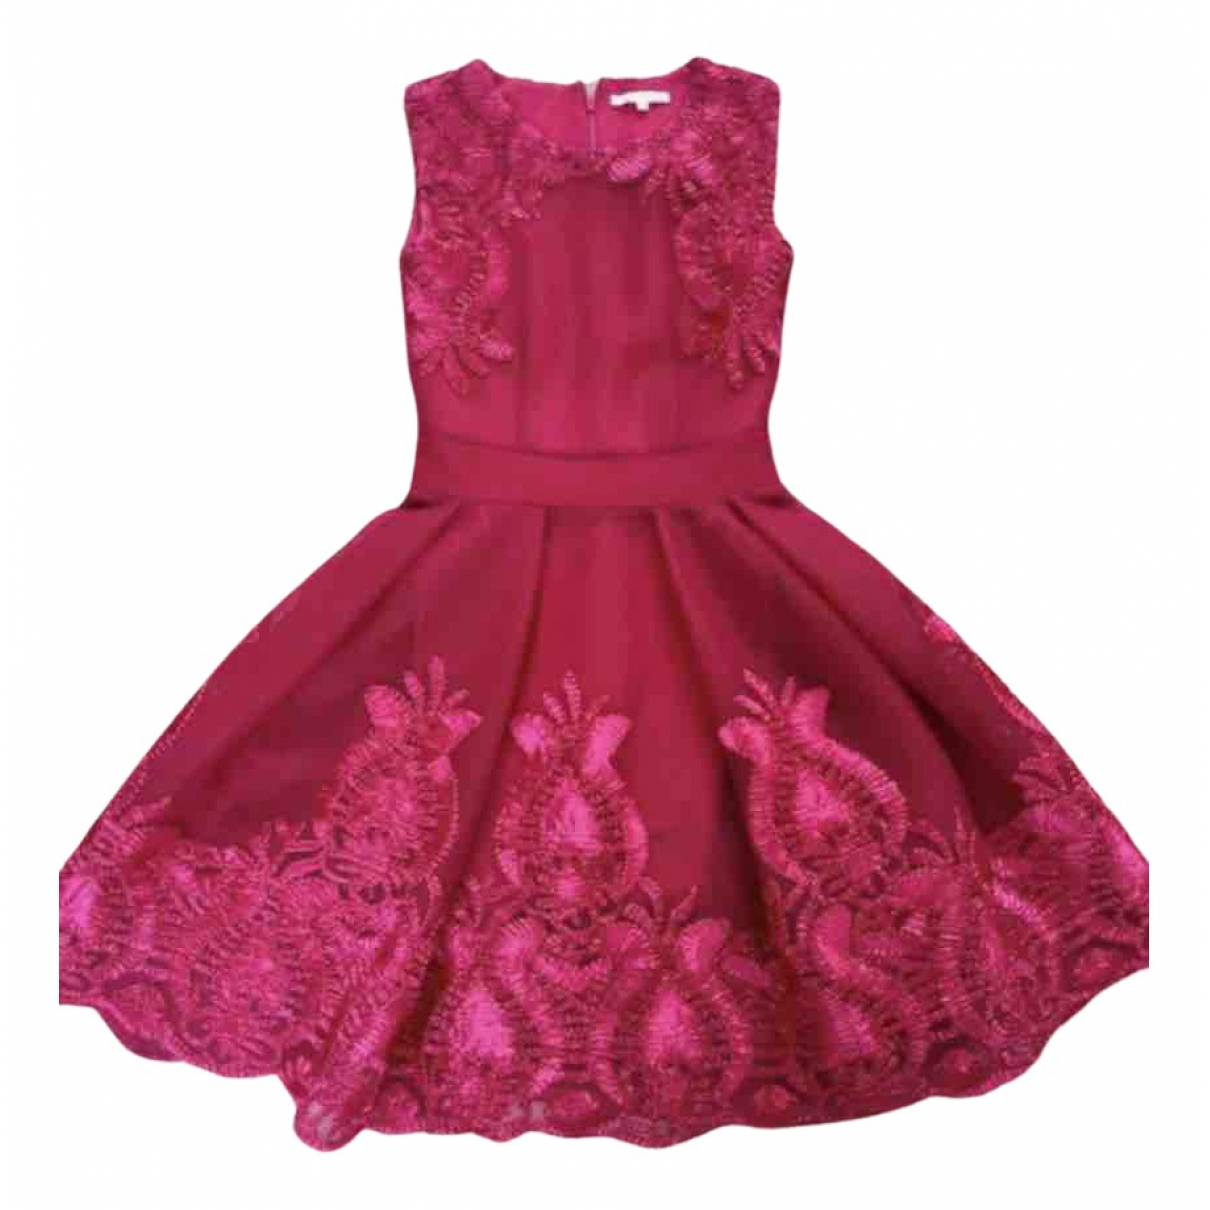 Maje Spring Summer 2019 Pink Lace dress for Women 36 FR